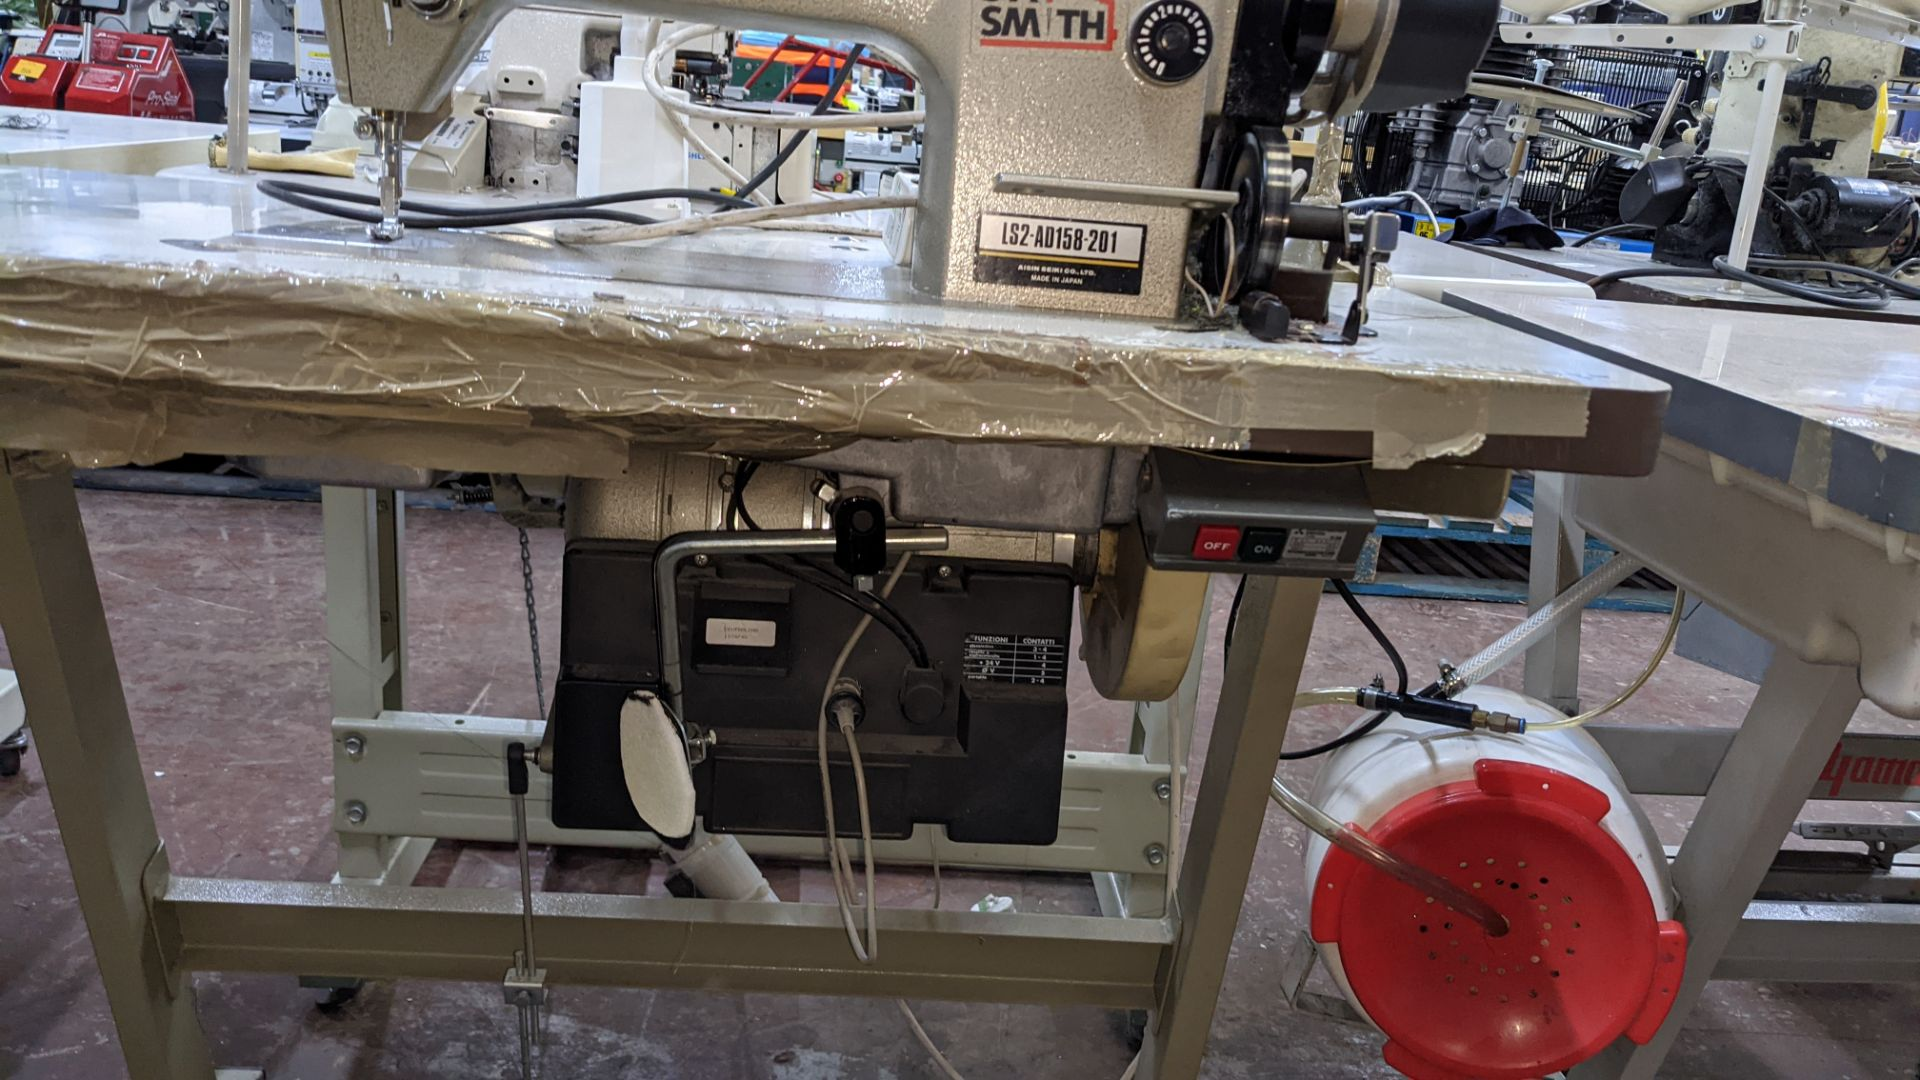 Toyota sewing machine - Image 14 of 17